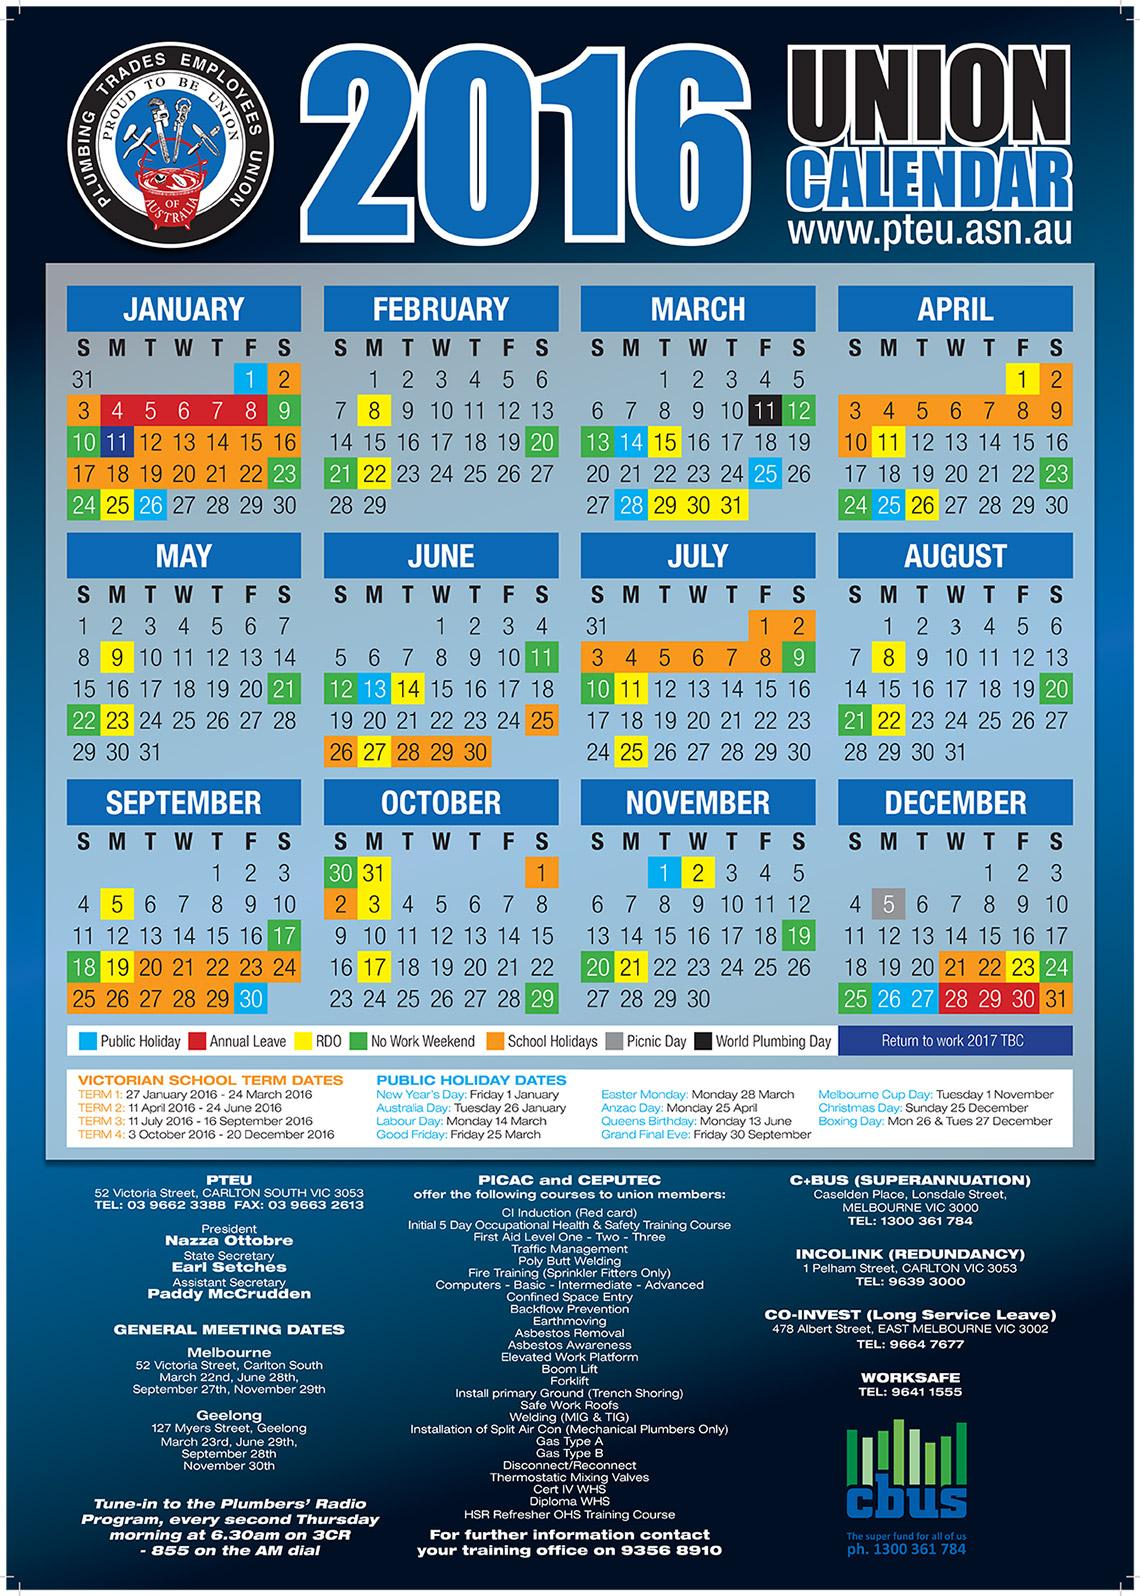 cfmeu calendar 2016